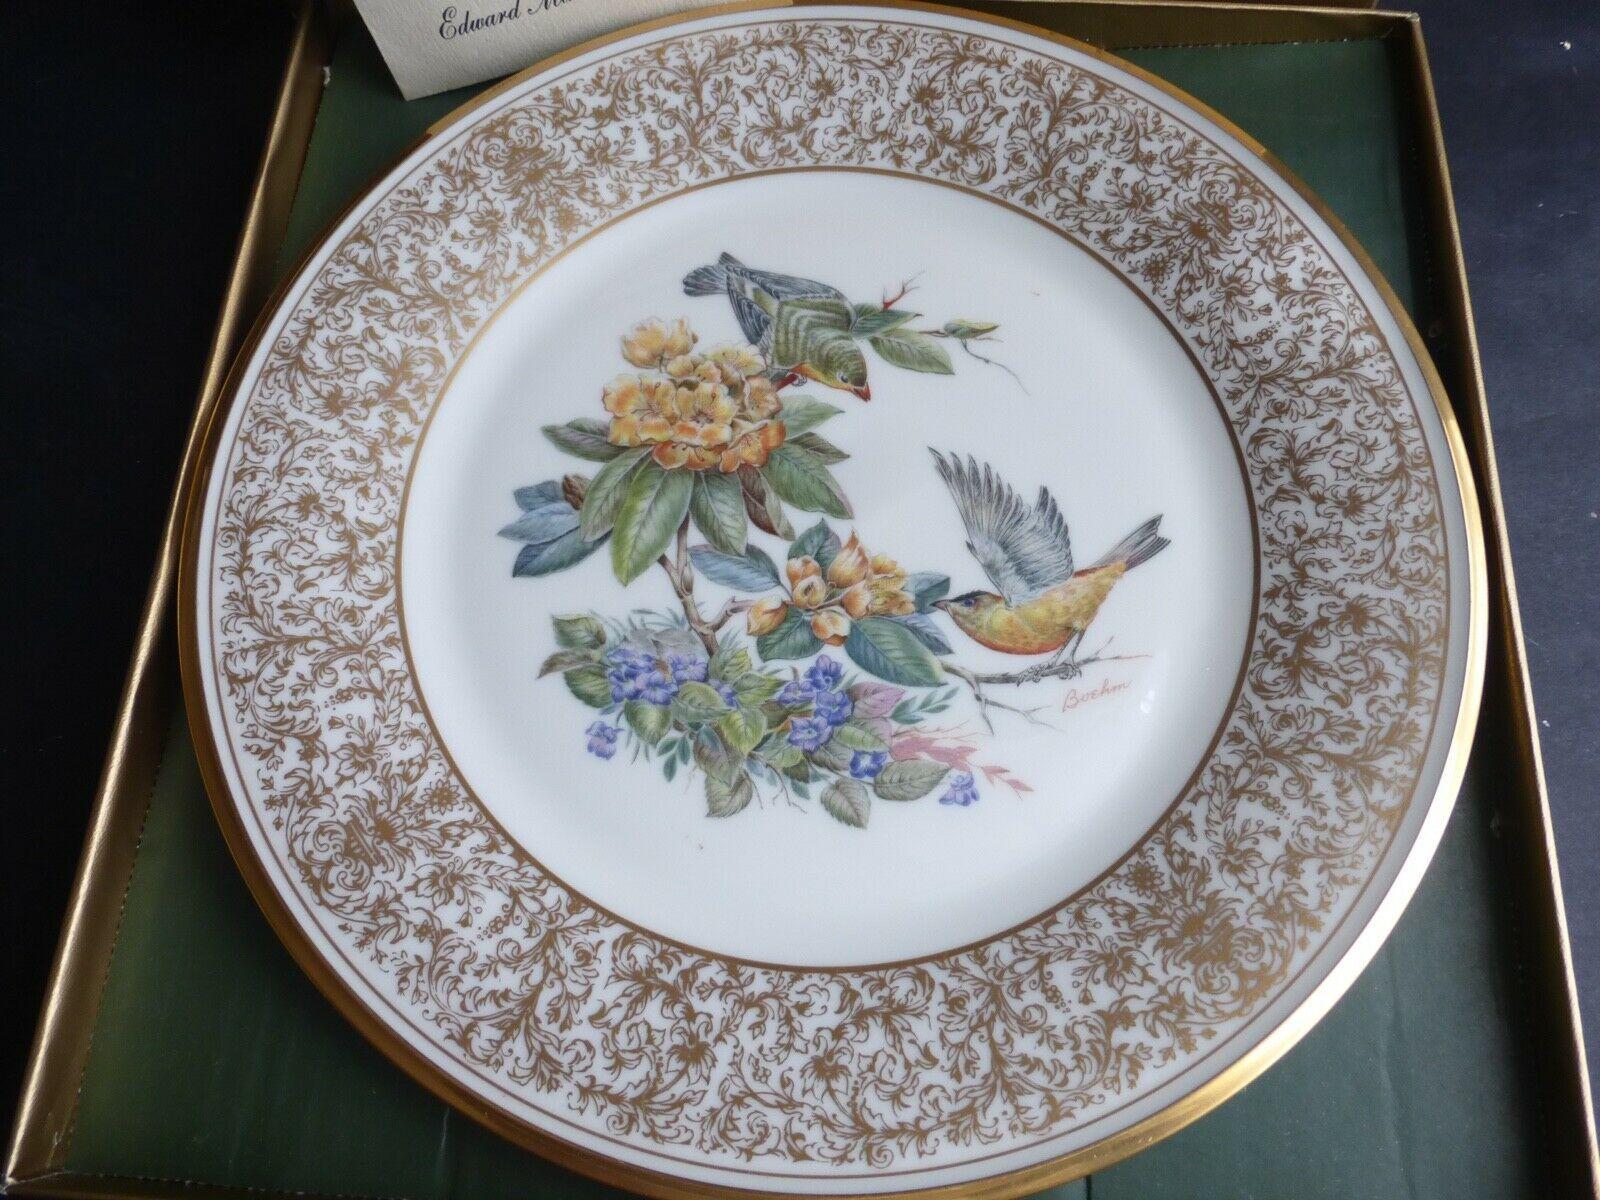 LENOX BOEHM BIRDS The Goldfinch 1971 Porcelain Plate 24-karat Gold